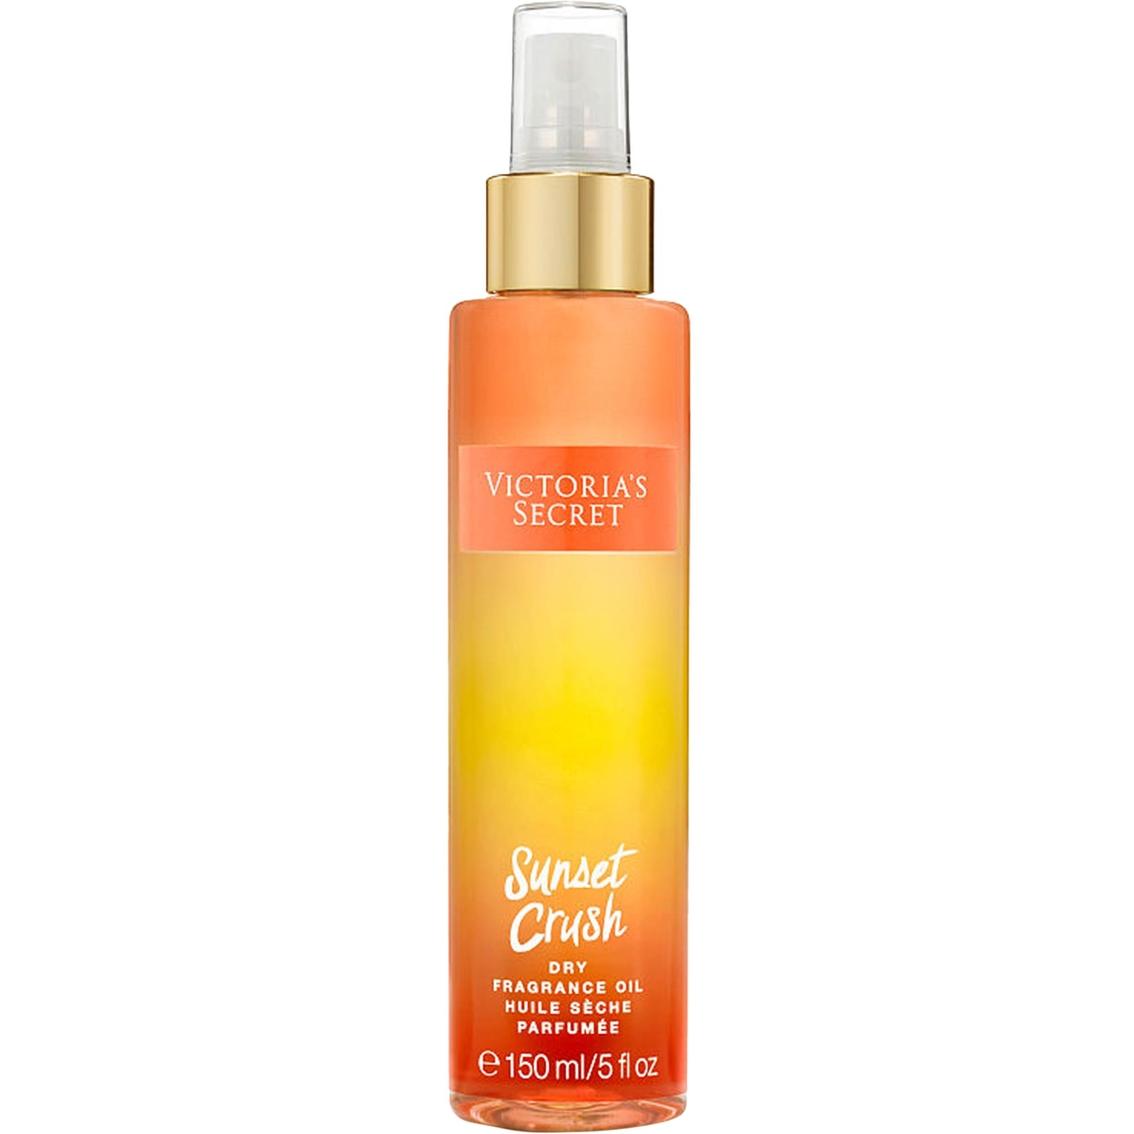 0bbb9439abf Victoria s Secret Sunset Crush 5 Oz. Fragrance Body Oil